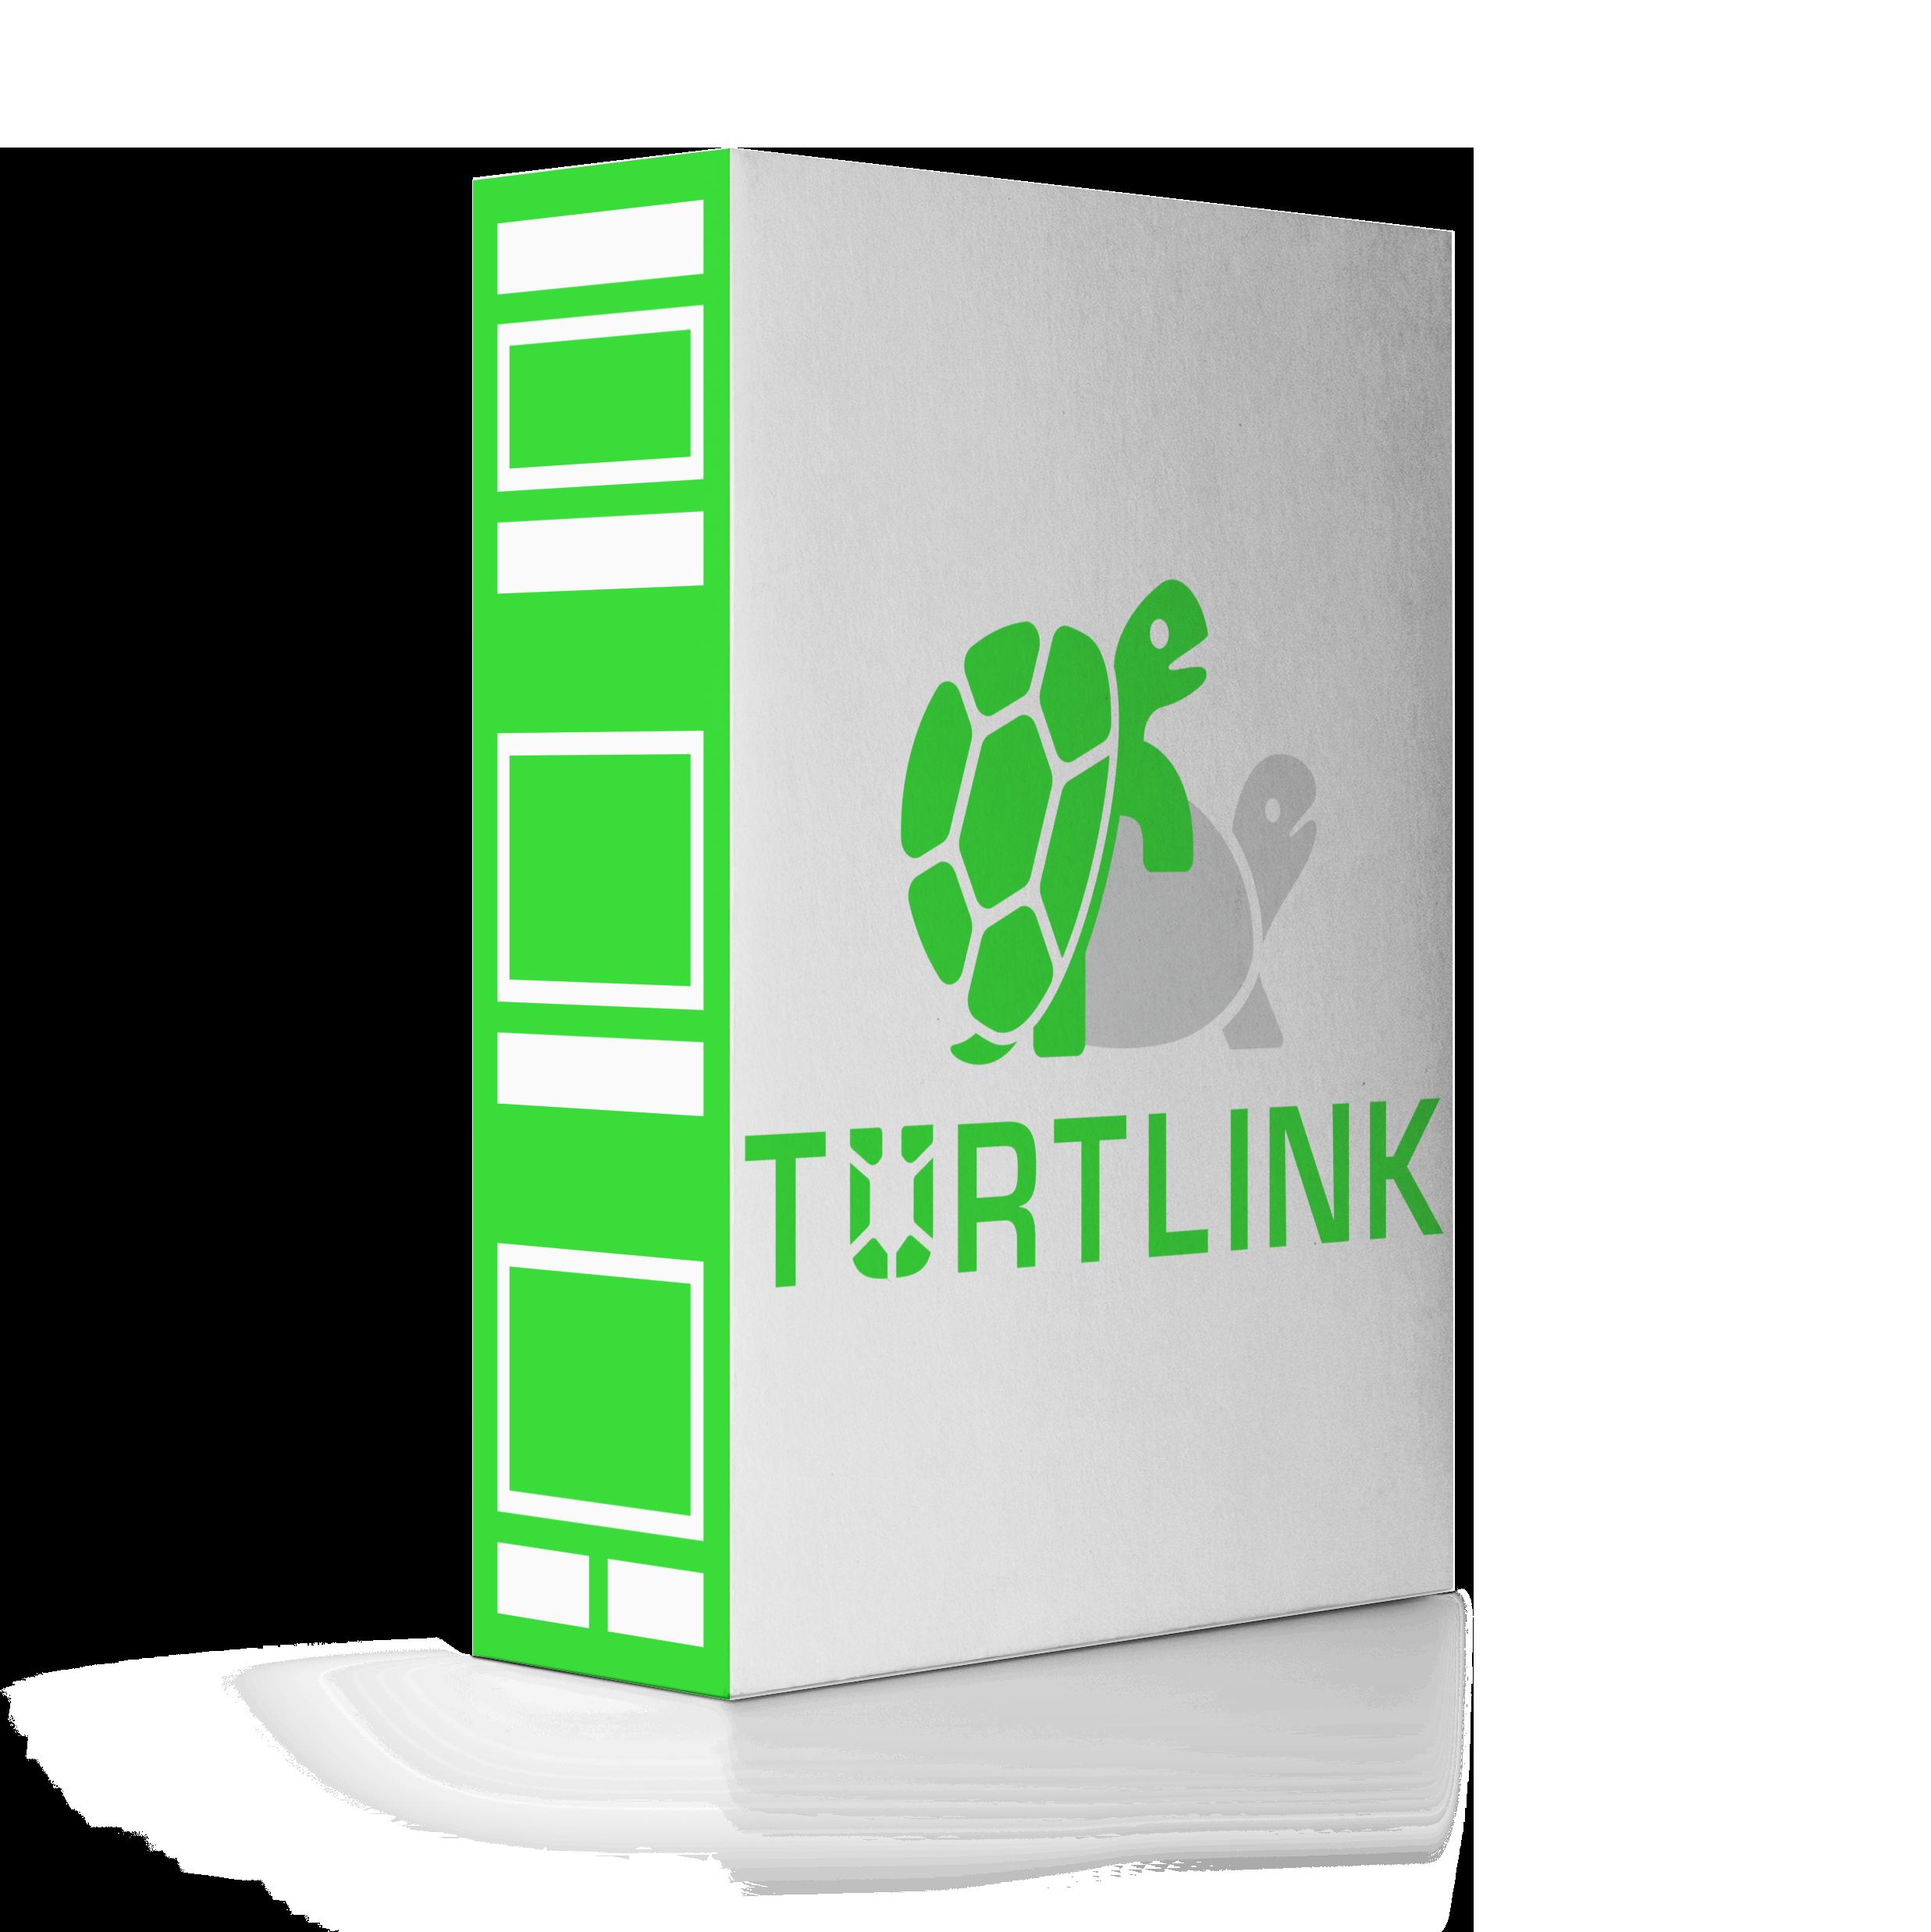 TURTLINKの詳細情報